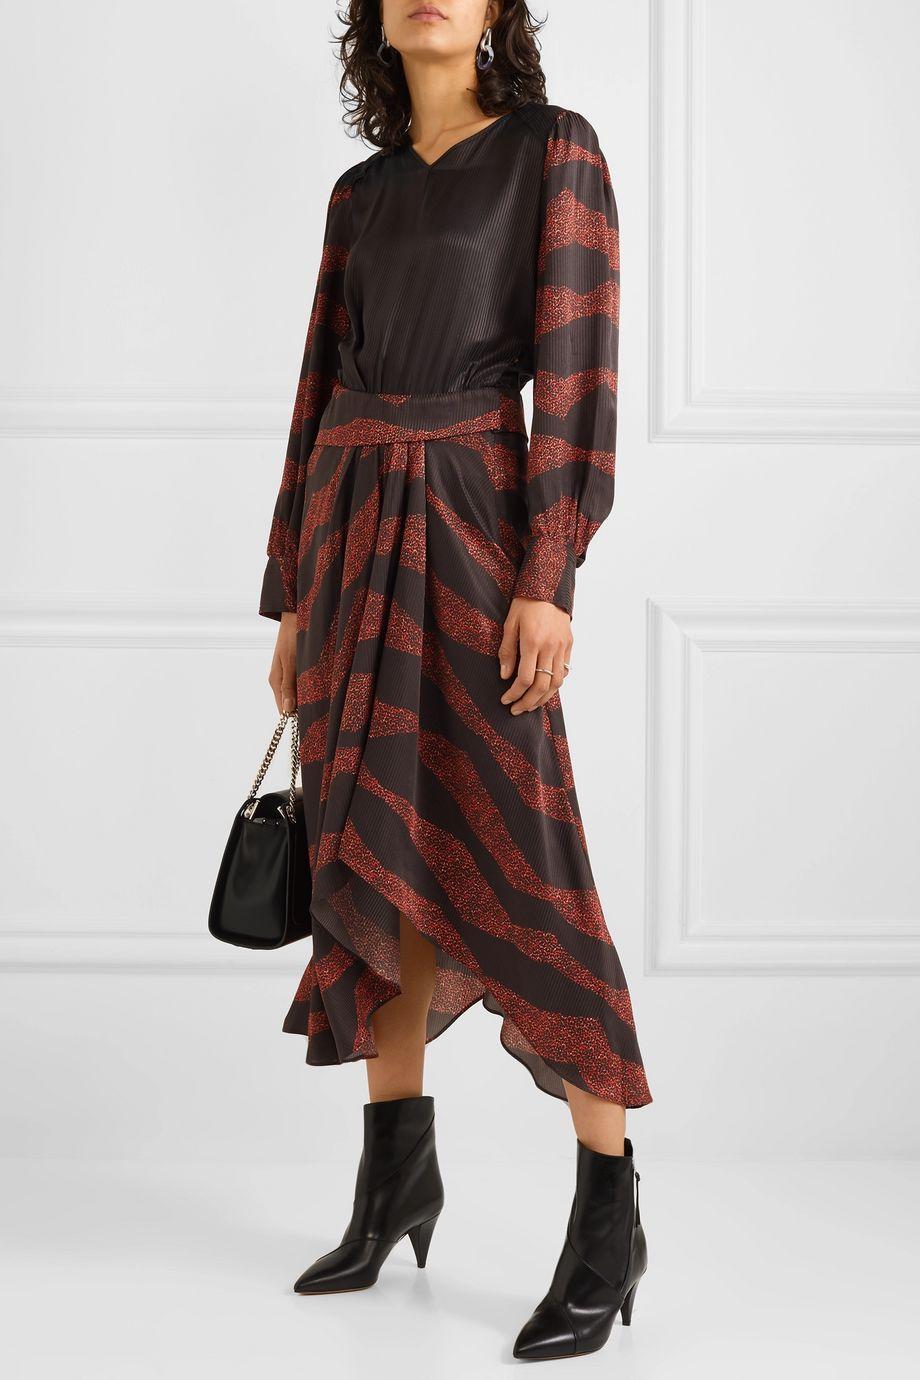 Isabel Marant Romina 不对称印花提花缎布中长连衣裙